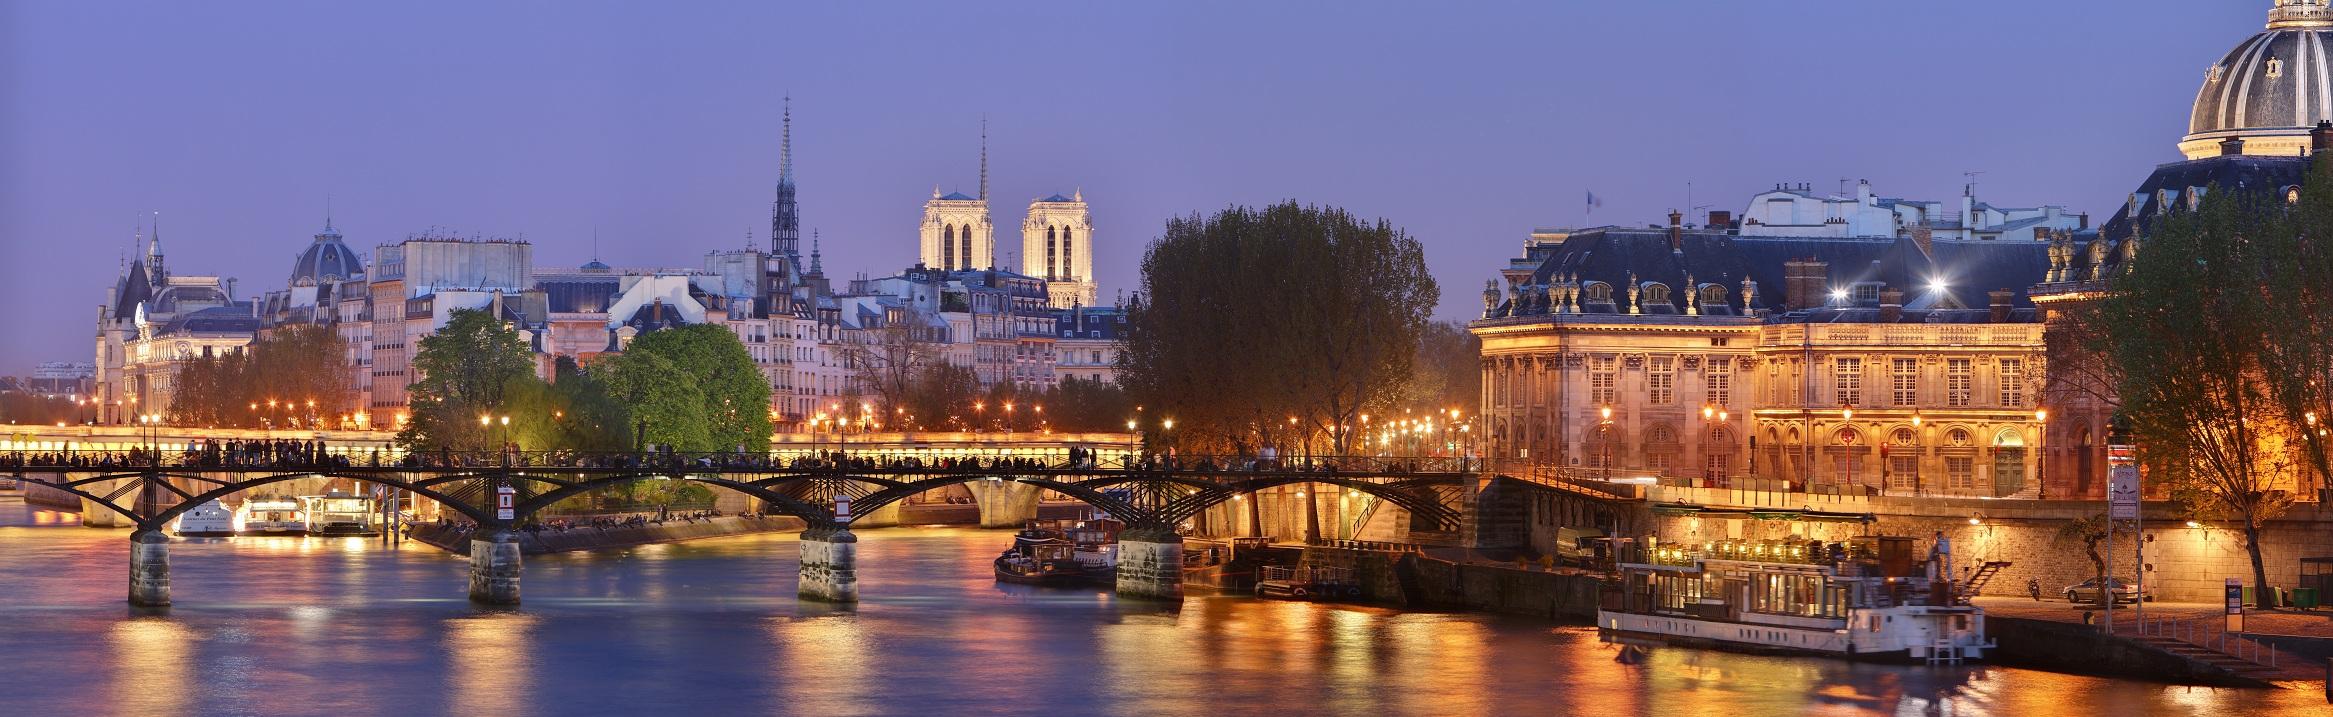 Pont_des_Arts,_Paris.jpg